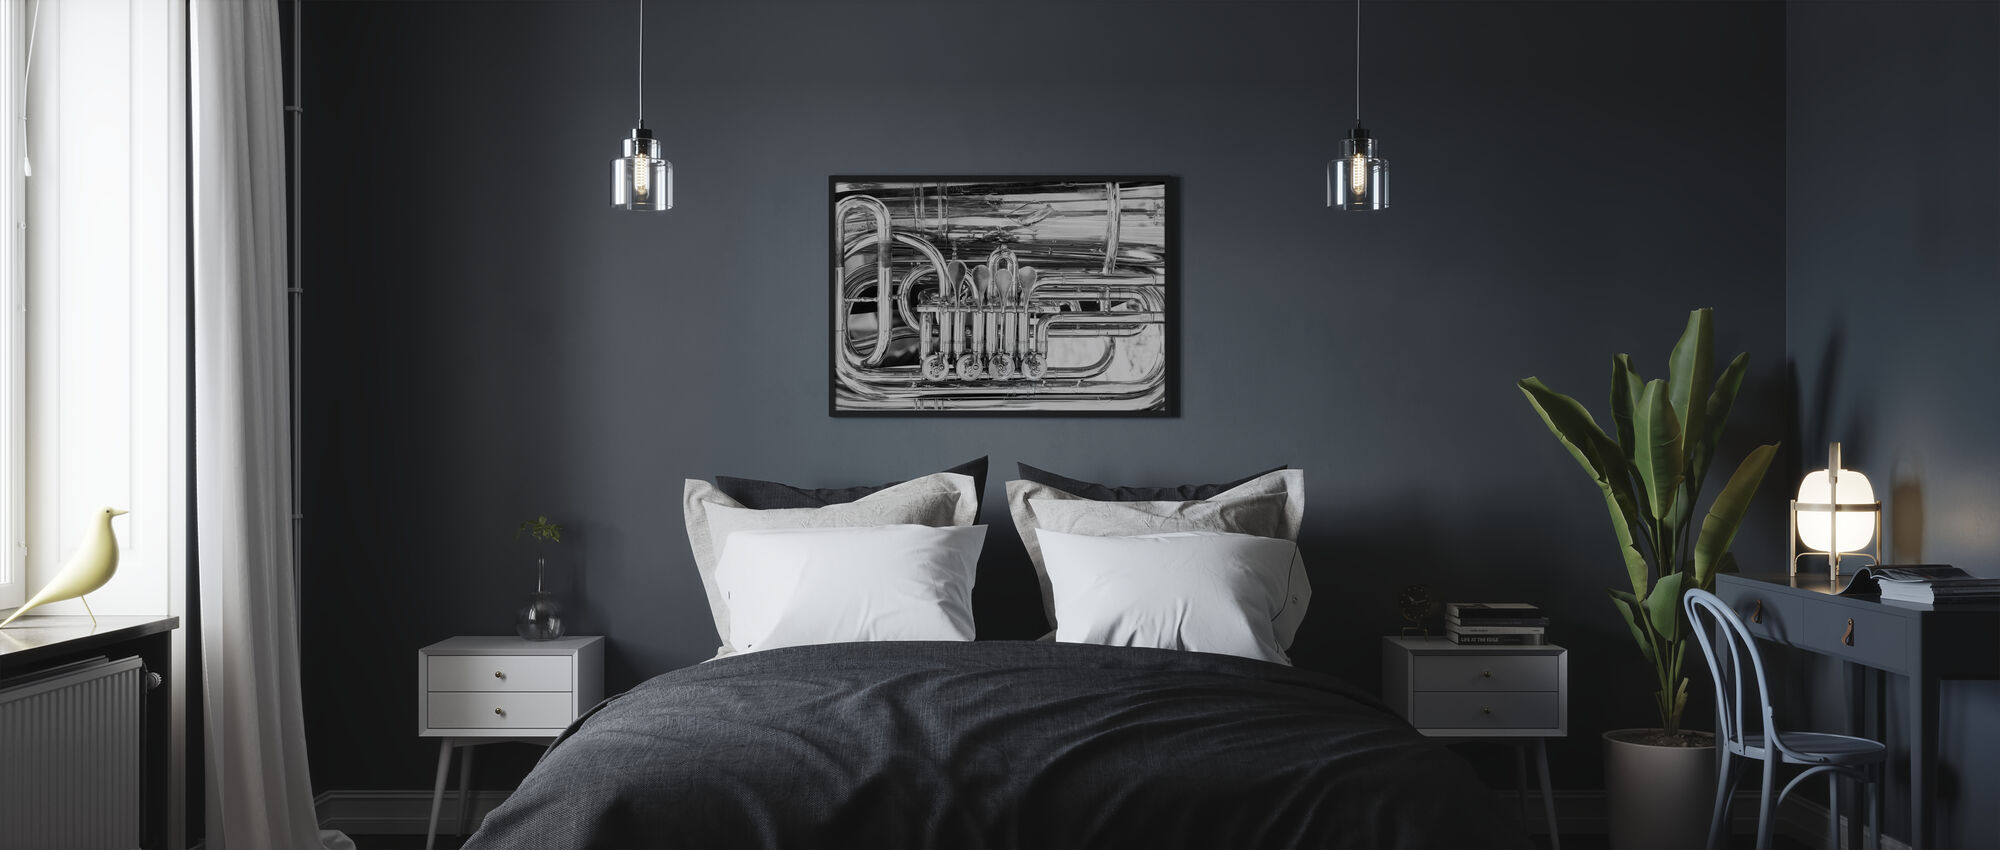 Messing Hoornklep - Grijs - Ingelijste print - Slaapkamer